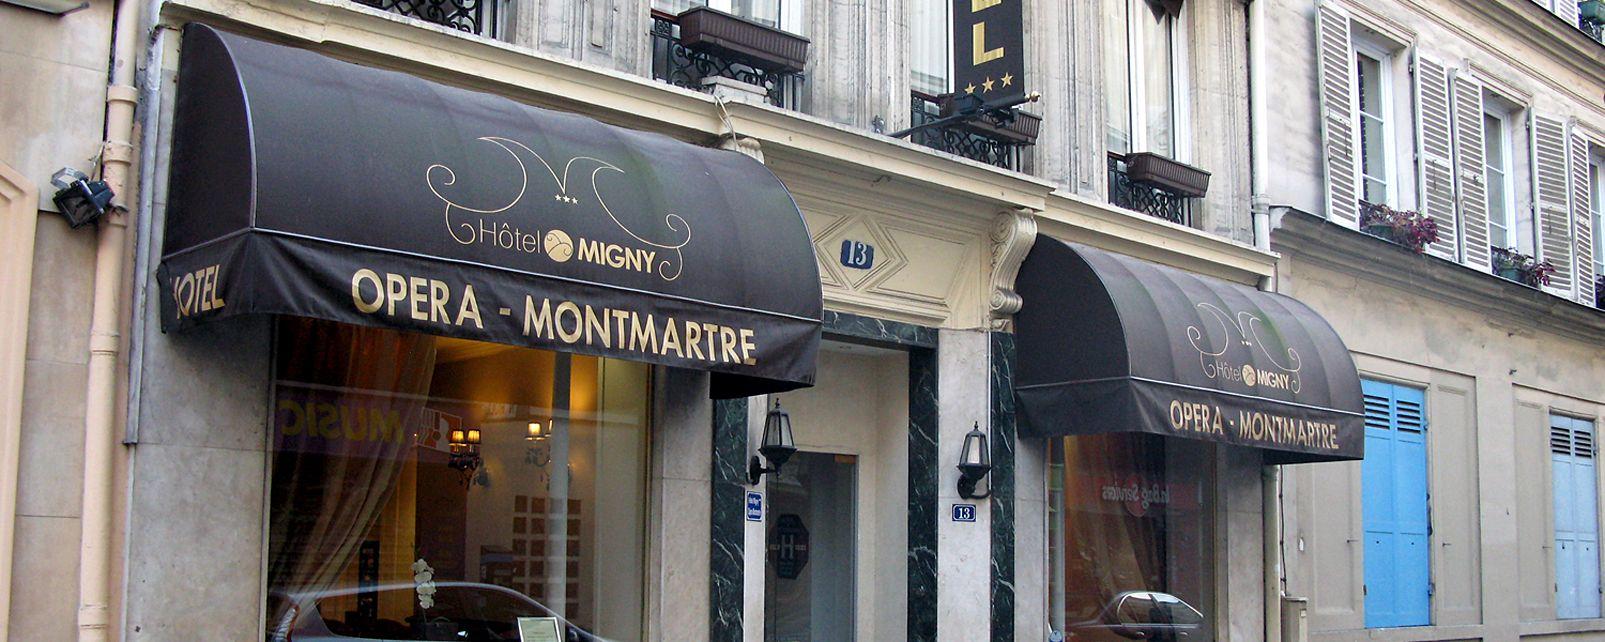 Migny Opera Montmartre Hotel Paris France